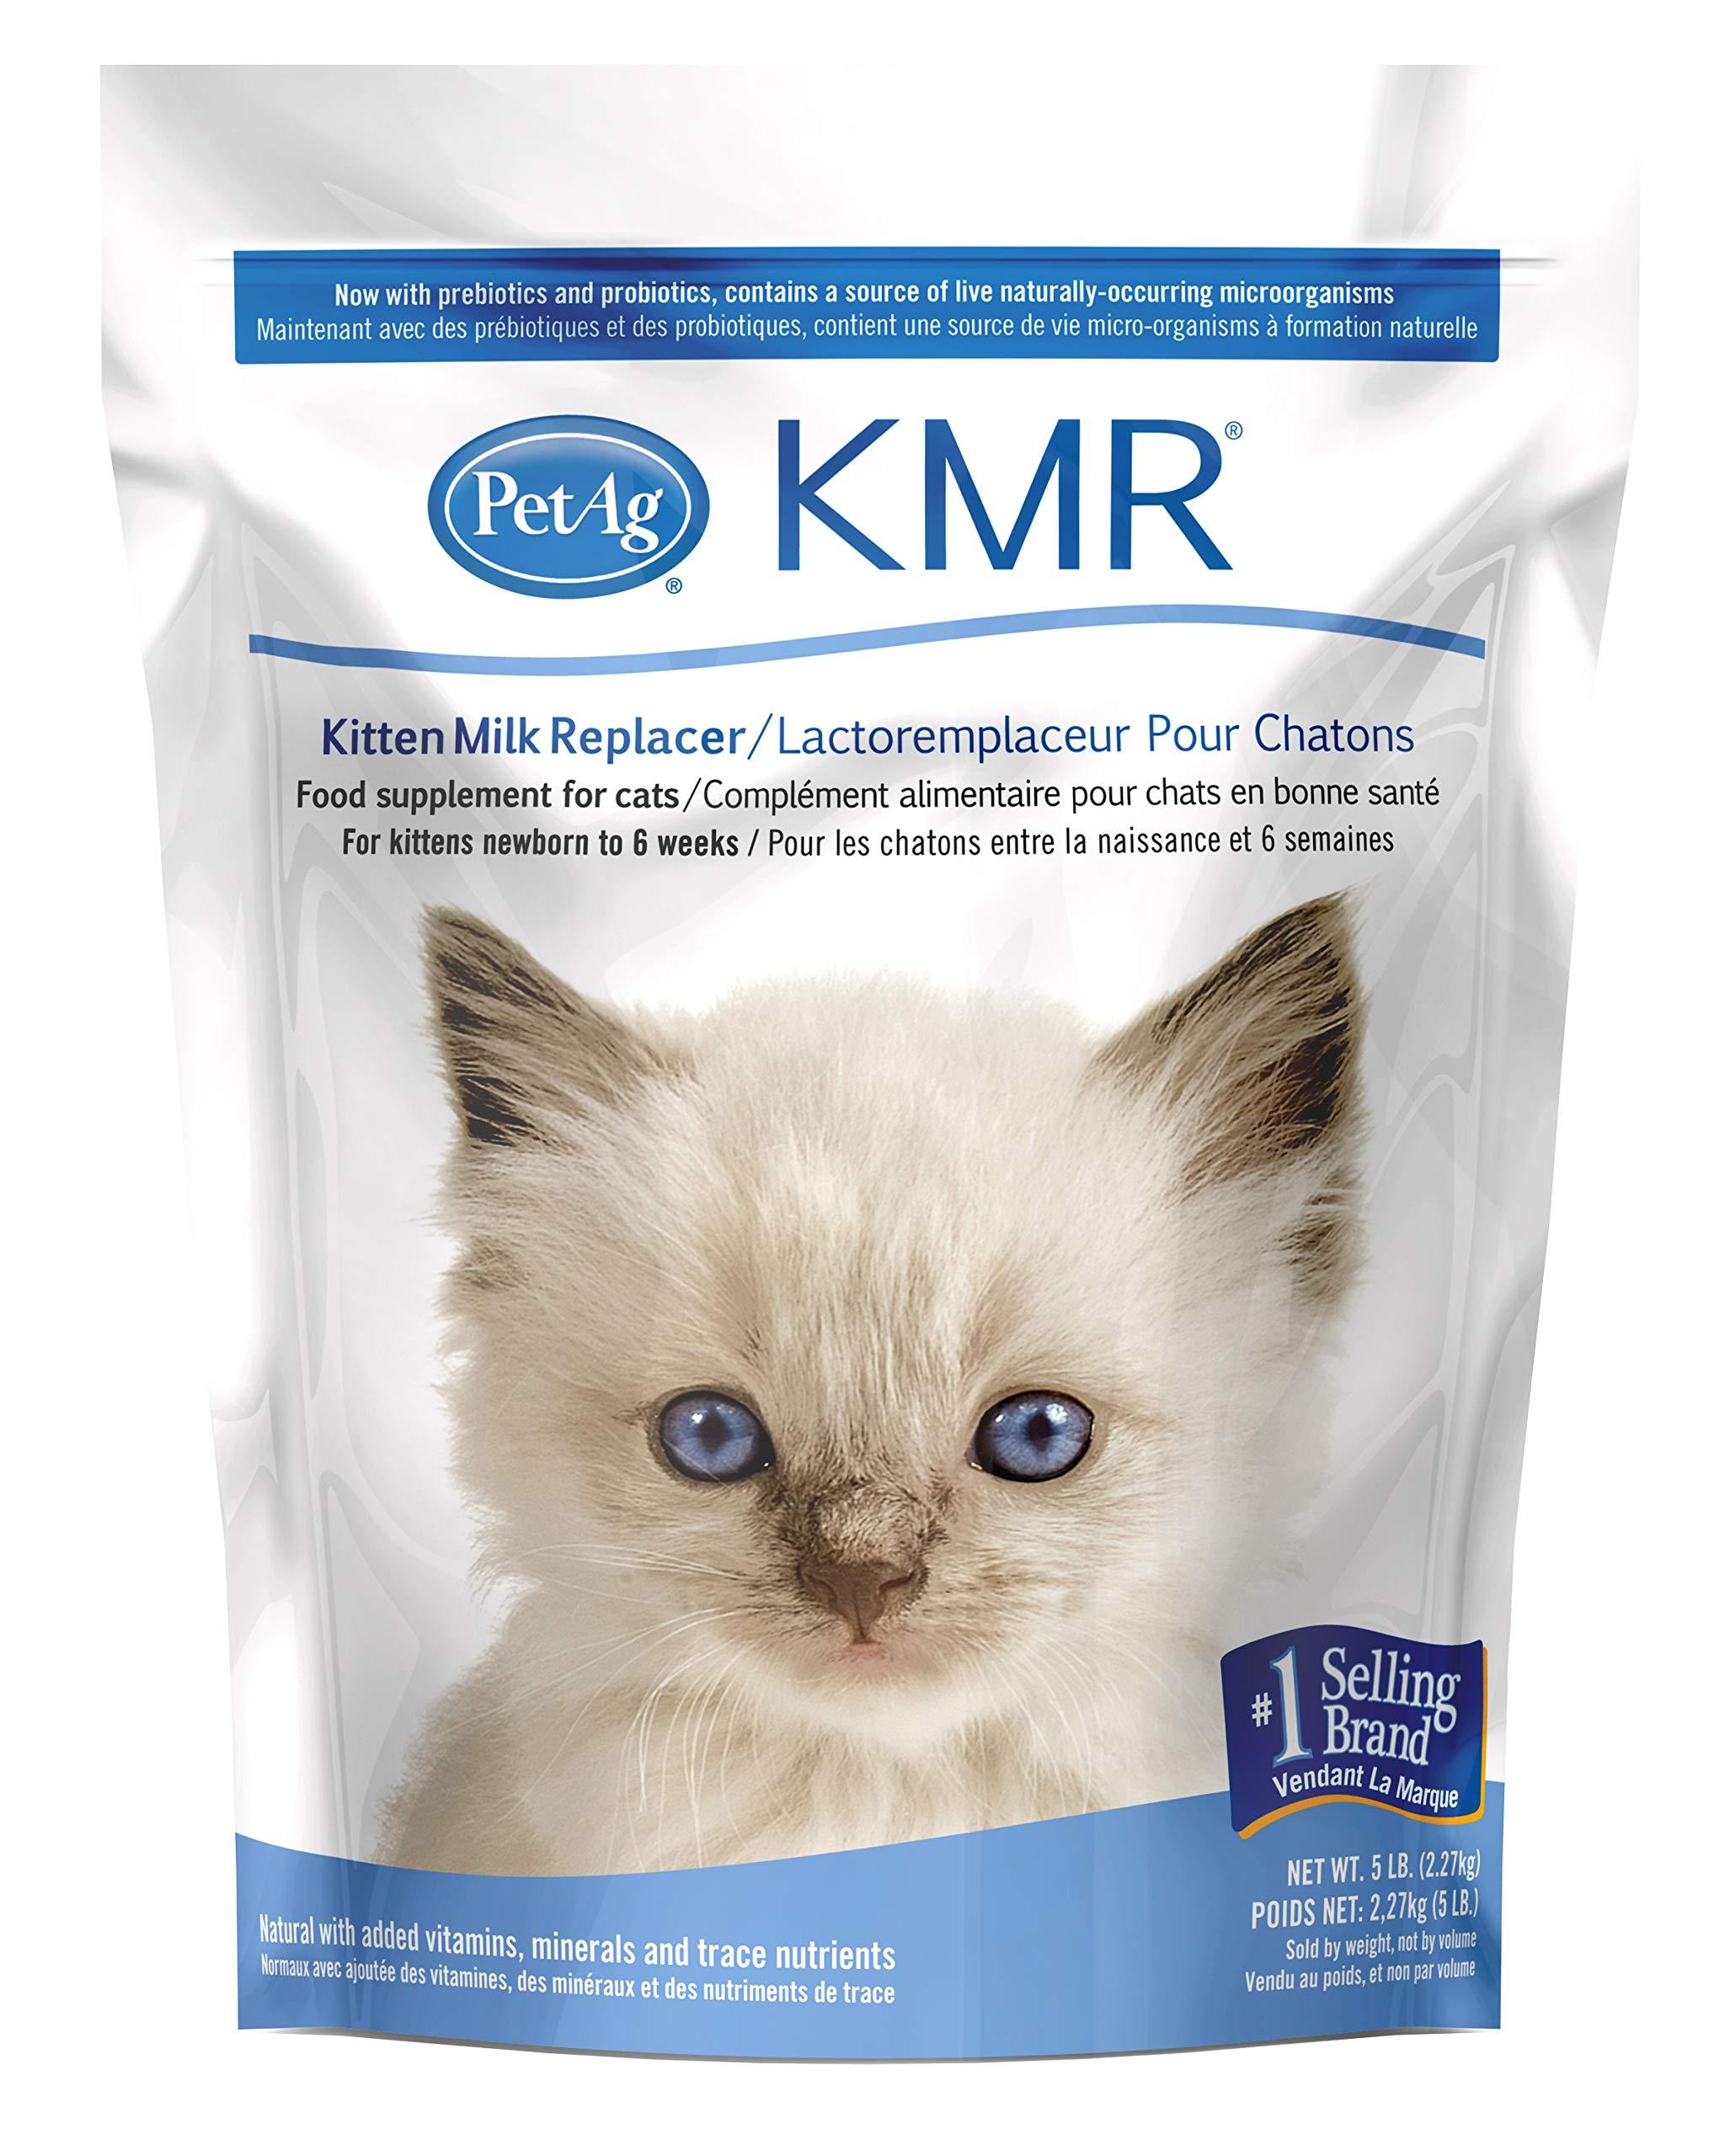 Petag Kitten Milk Replacer Kmr Powder Buy Online In Gibraltar At Desertcart